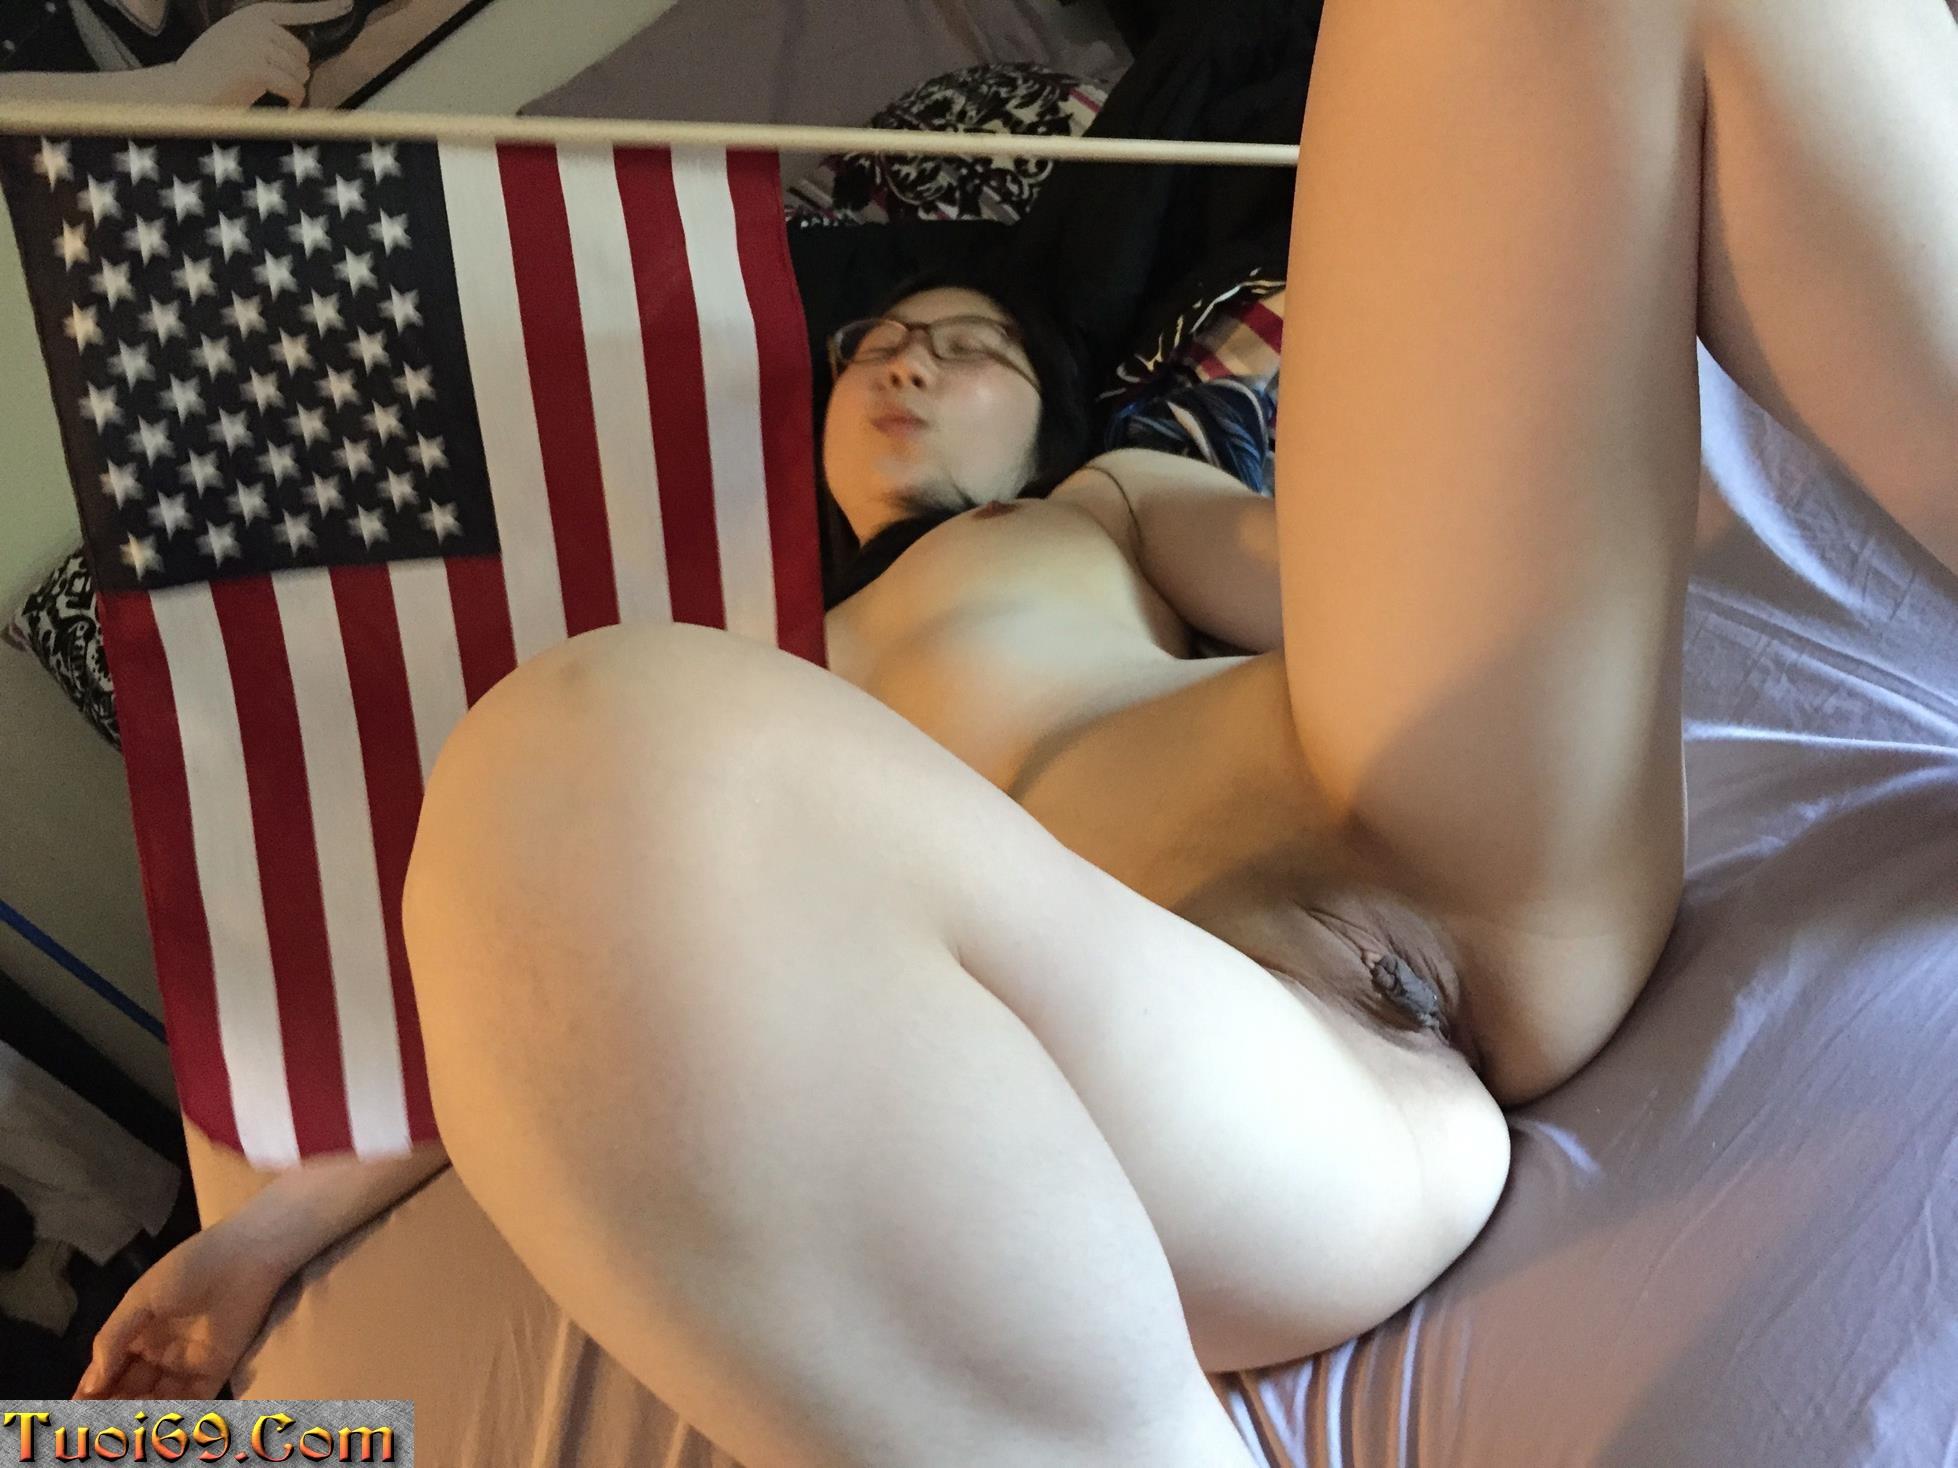 Cute-Korean-Carmen-nice-boobs-wet-pussy-masturbate-and-sex-photos-leaked-17-Copy